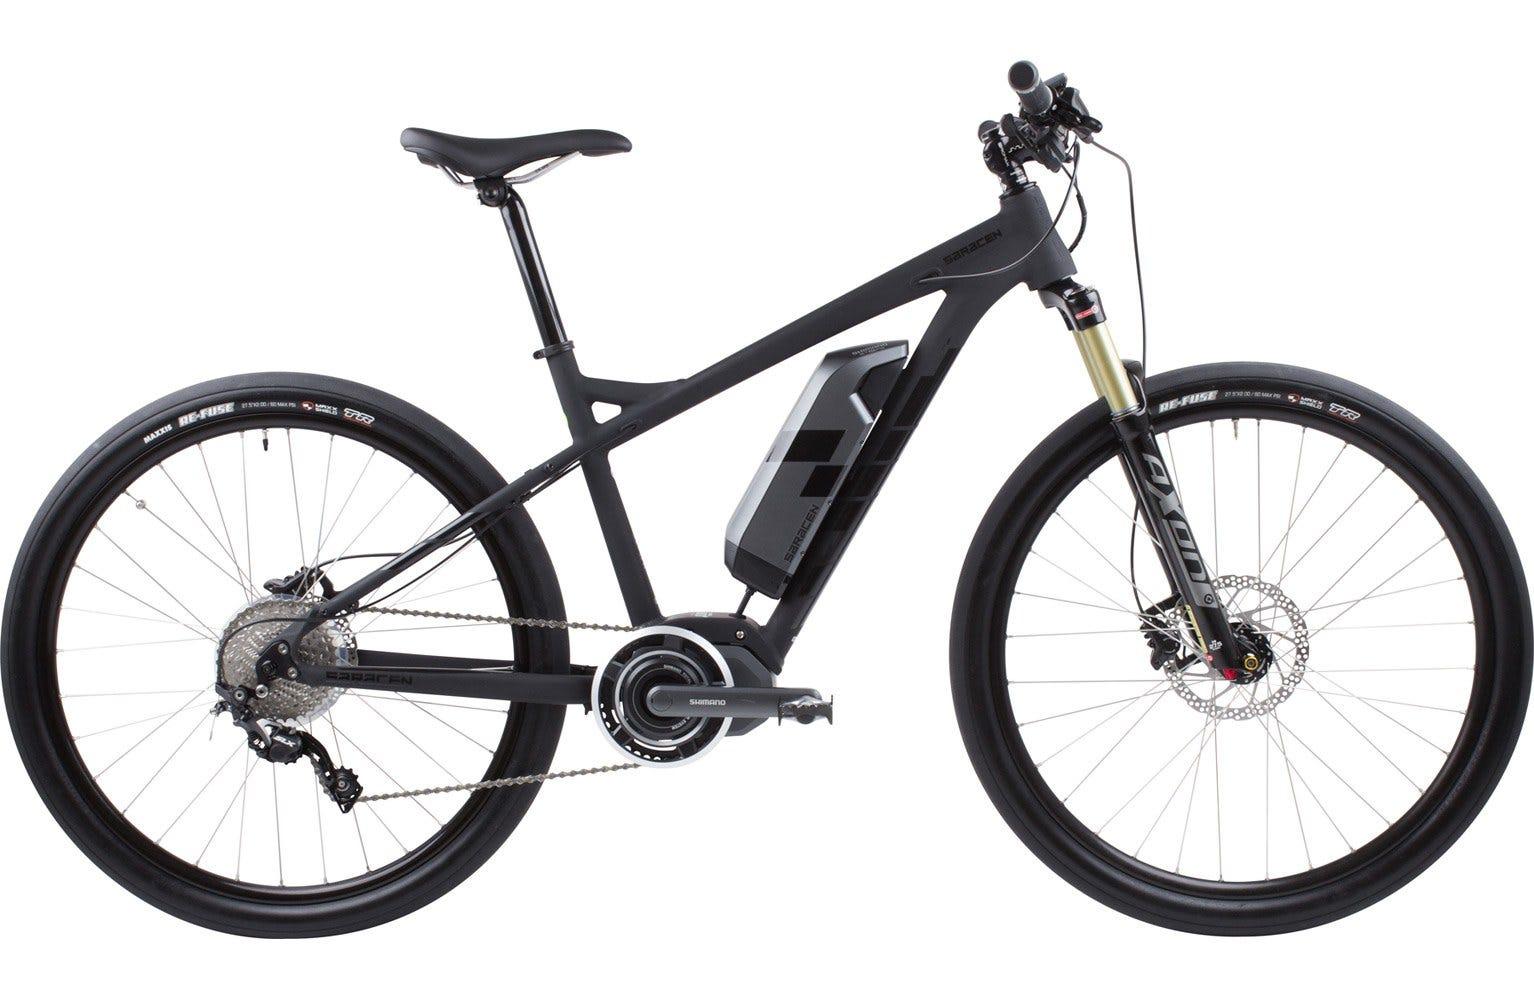 Saracen Juiced 19 inch bike Ex Display